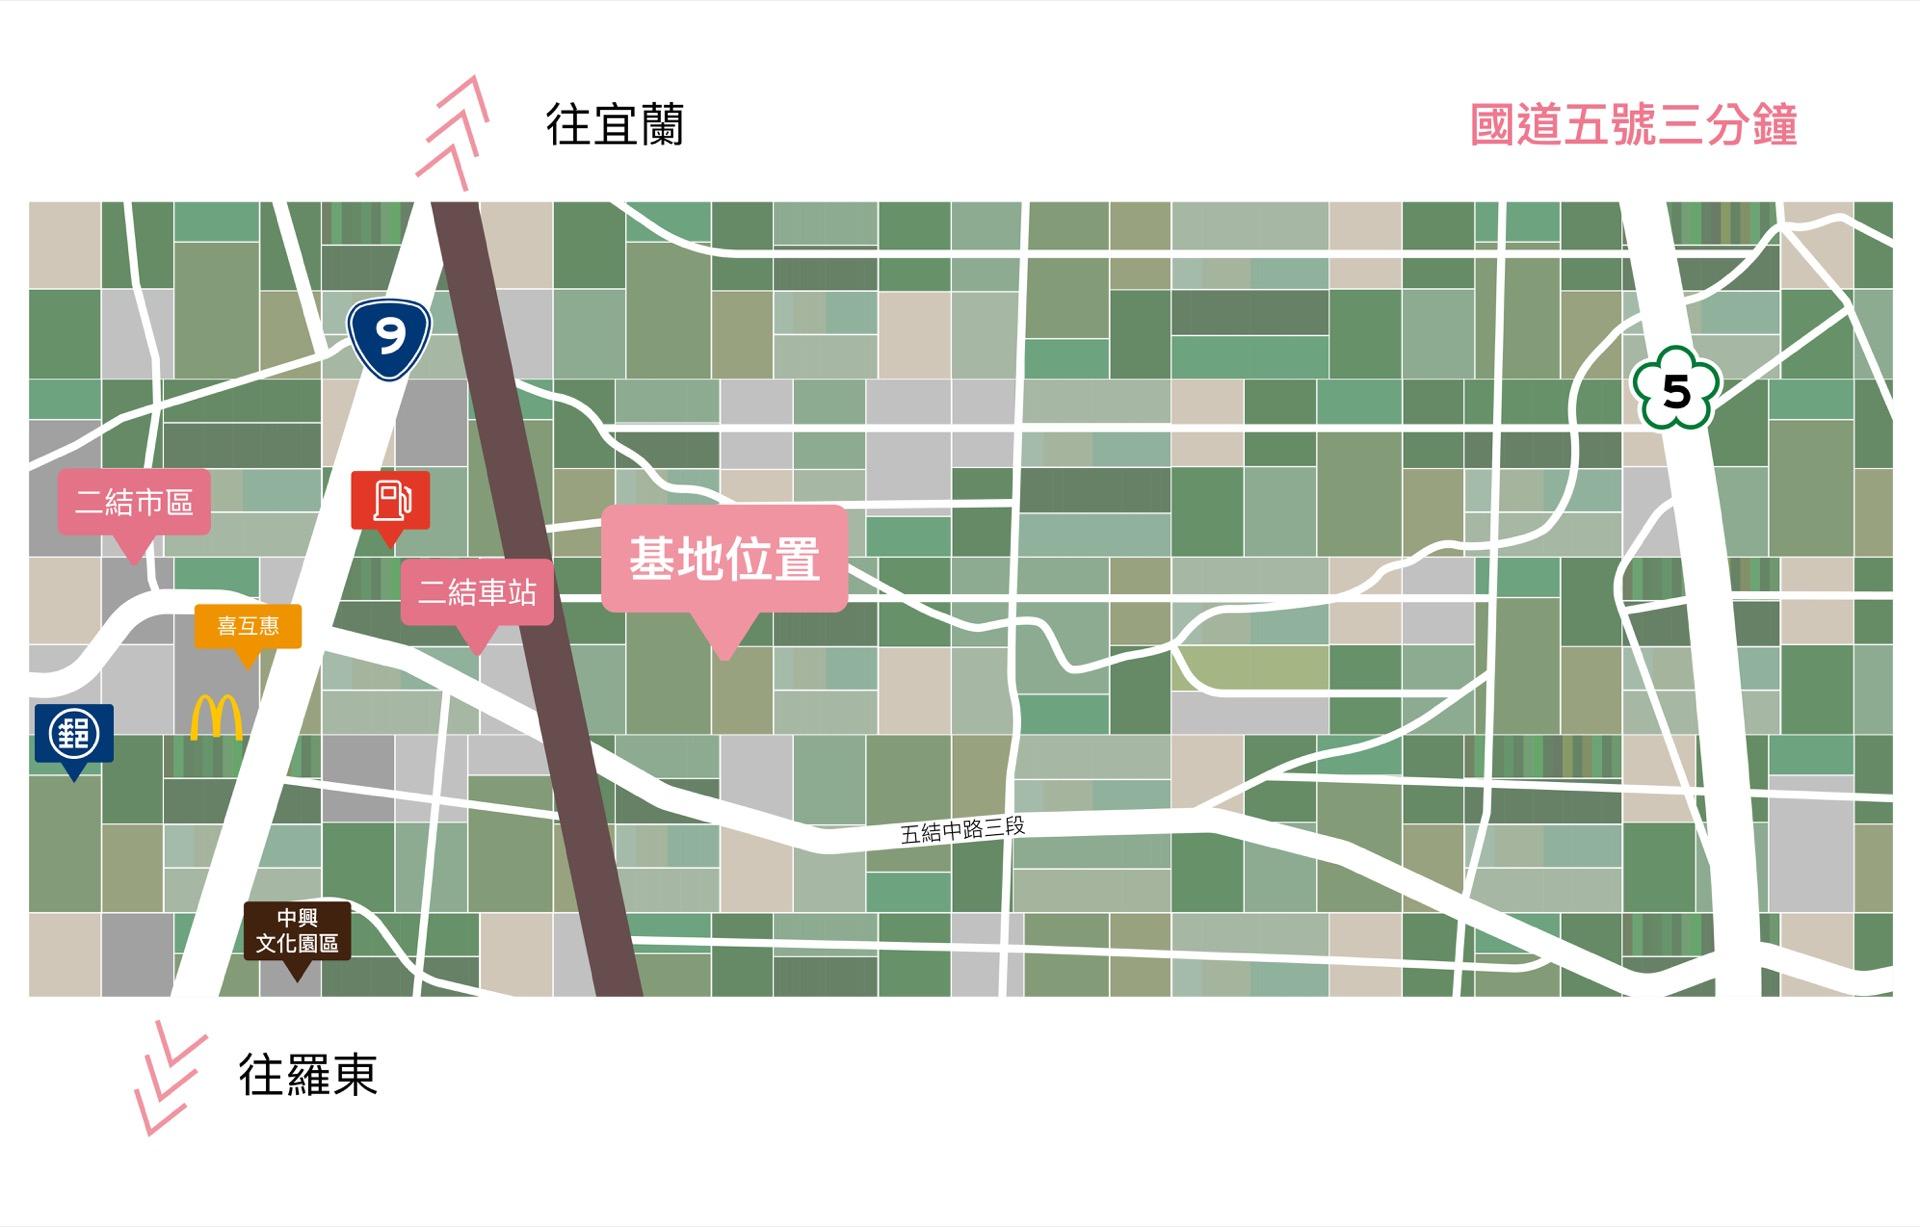 德築-DEZU-project-Zuyin-architecture-building-map